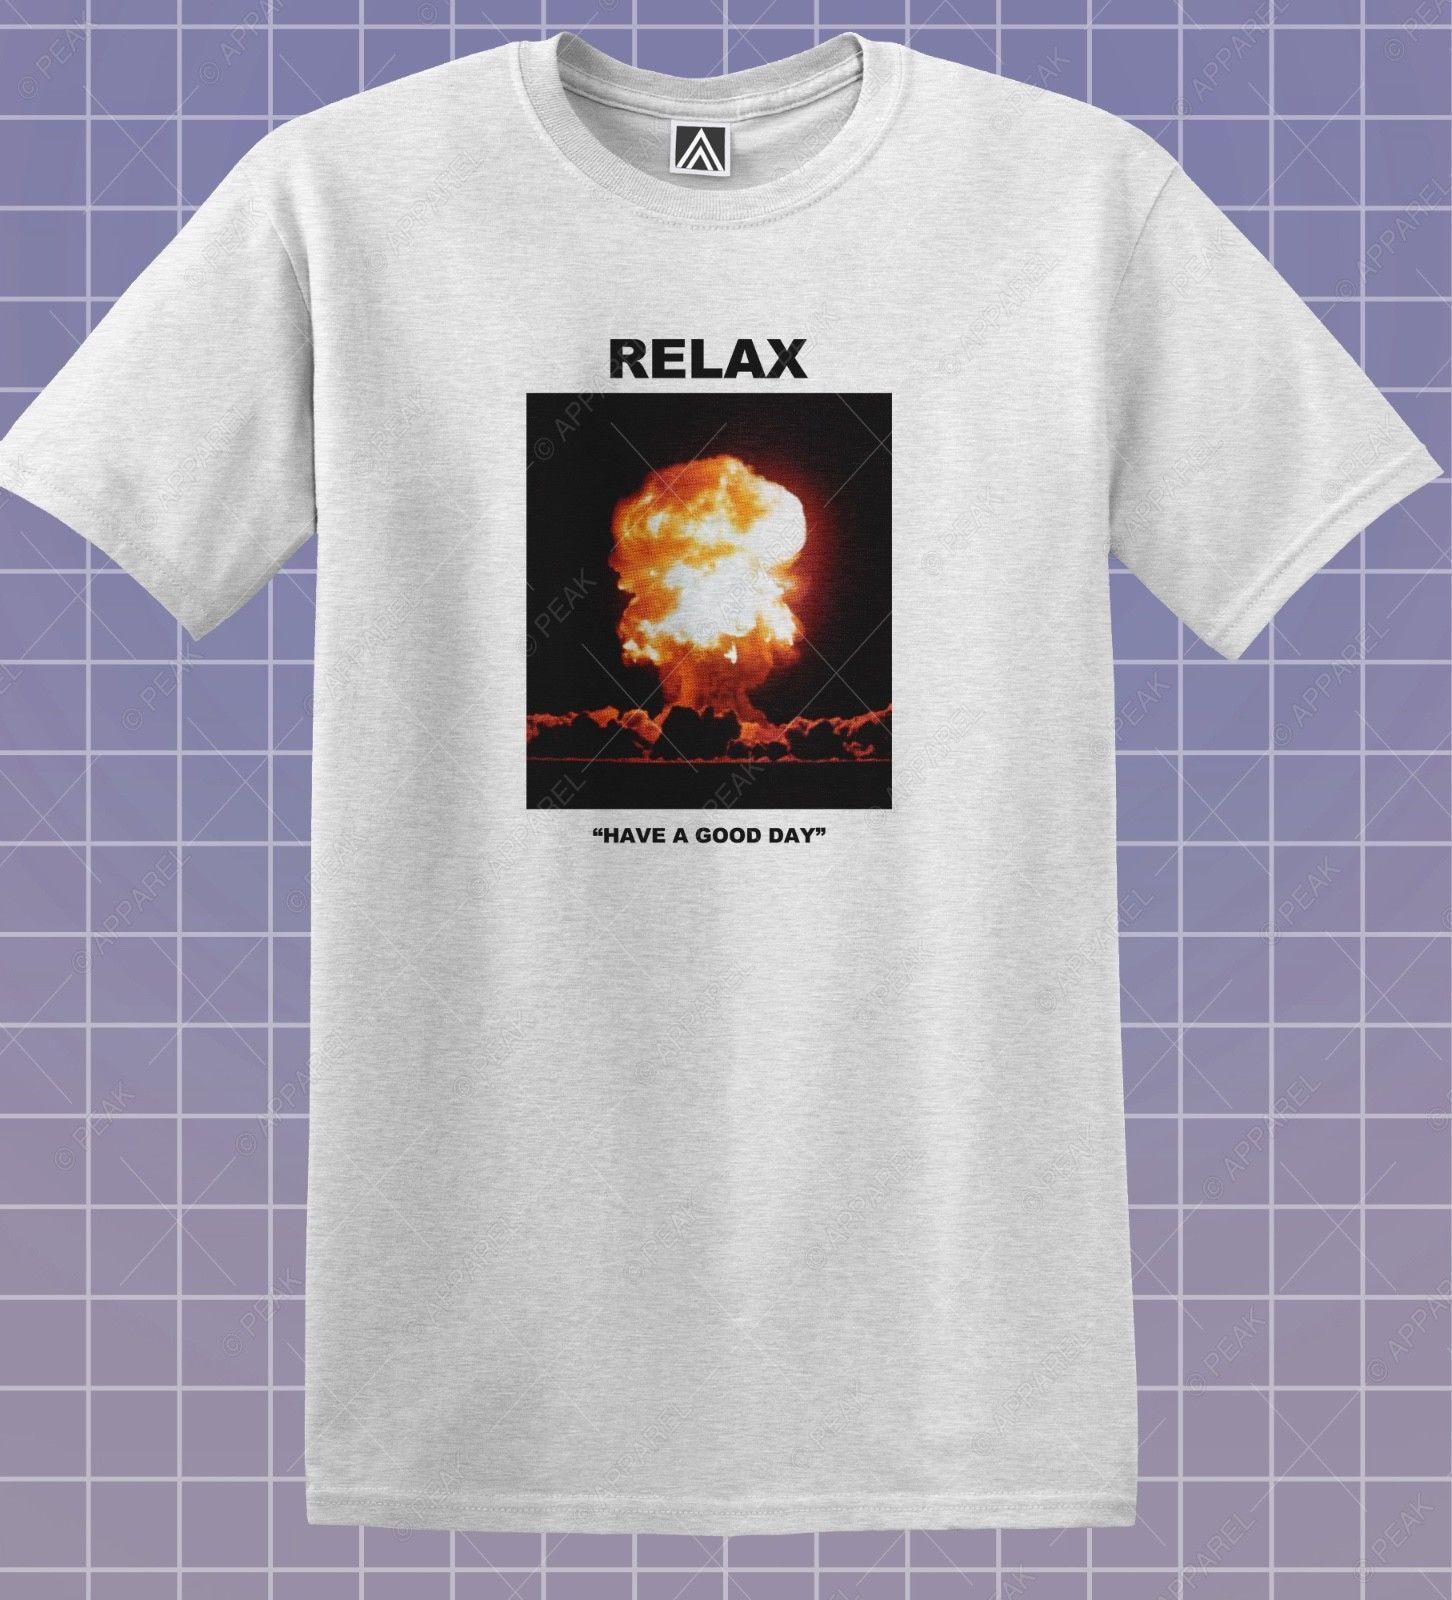 633771e6a Relax T Shirt Mushroom Cloud Hazard Tee Gosha Style Heron War Good Day Top  Cool Casual Pride T Shirt Men Unisex New Fashion Best Sites For T Shirts Tee  ...